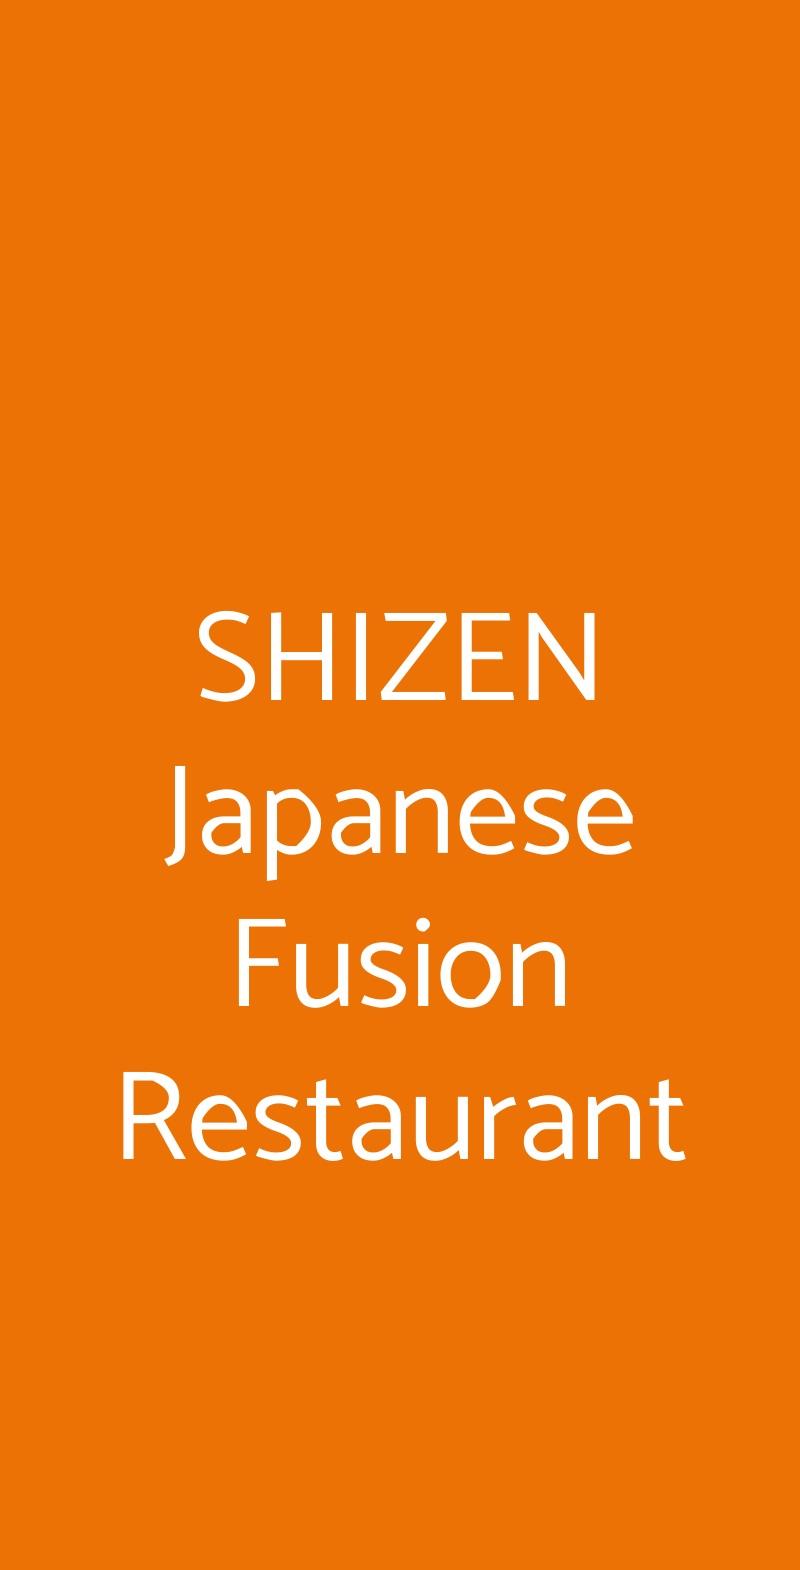 SHIZEN Japanese Fusion Restaurant Milano menù 1 pagina